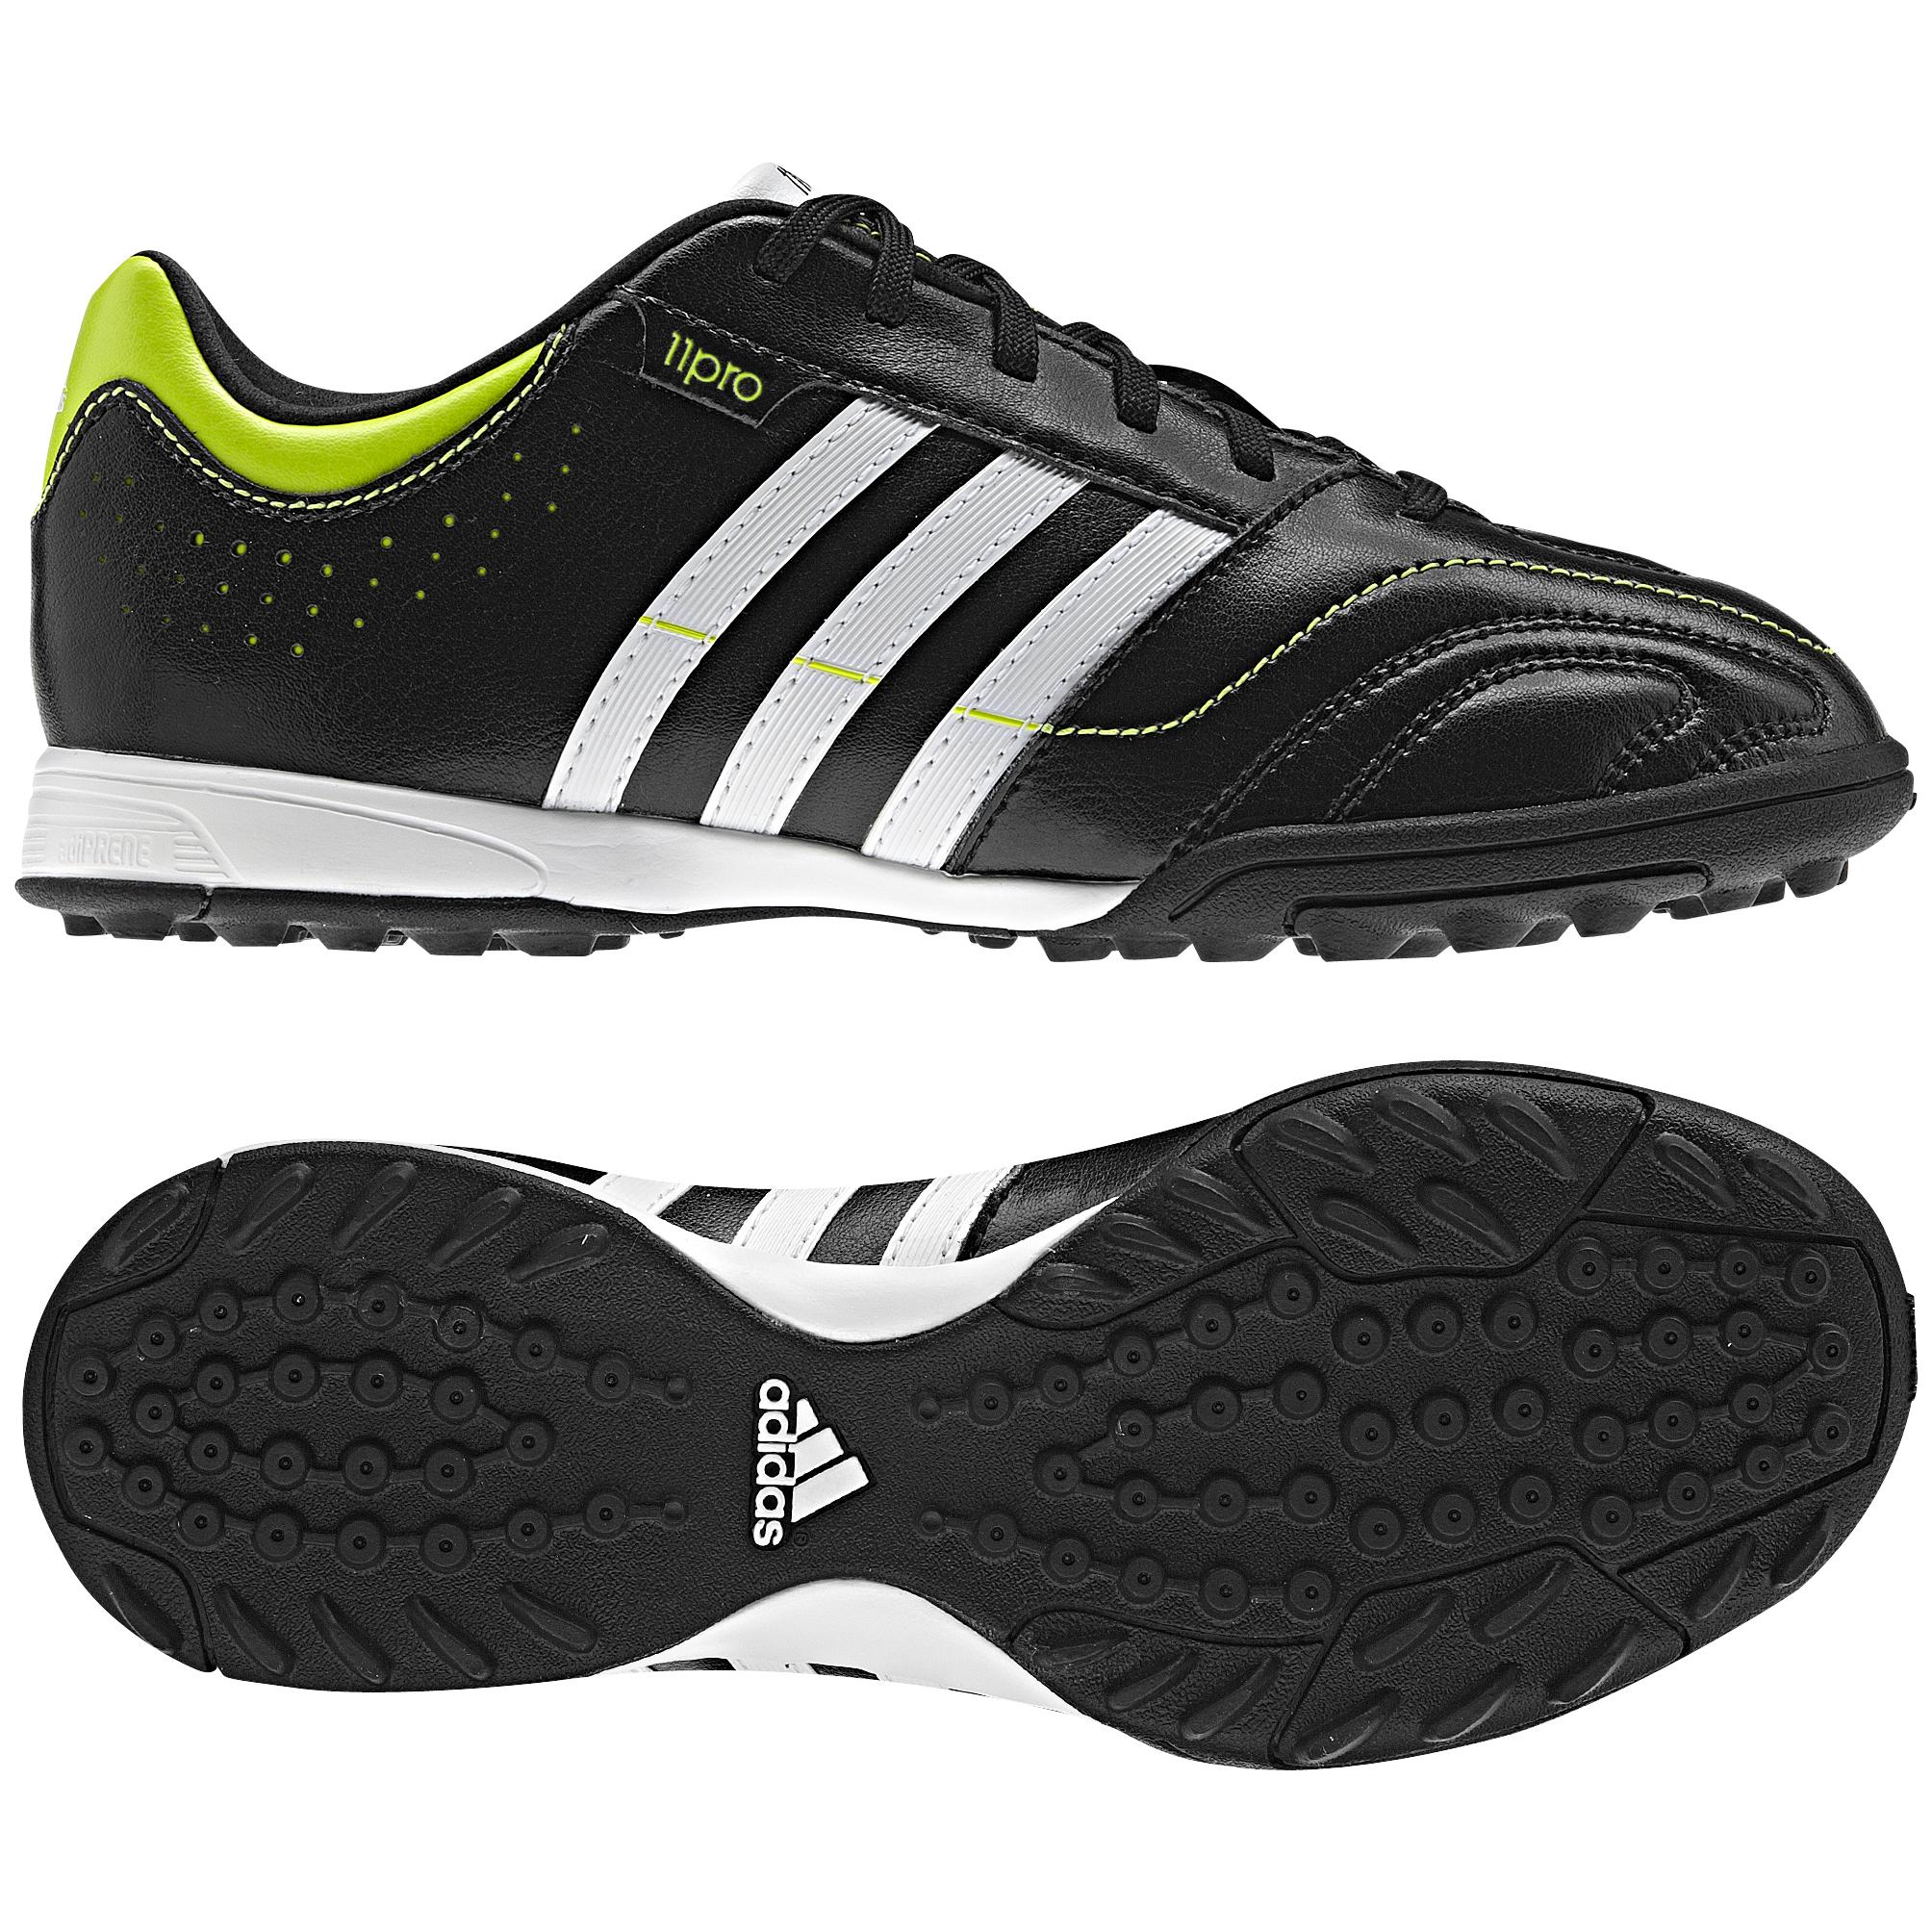 more photos e87ea df13e adidas 11Nova TRX Astro Turf Trainers - Kids - Black 1 Running White Slime